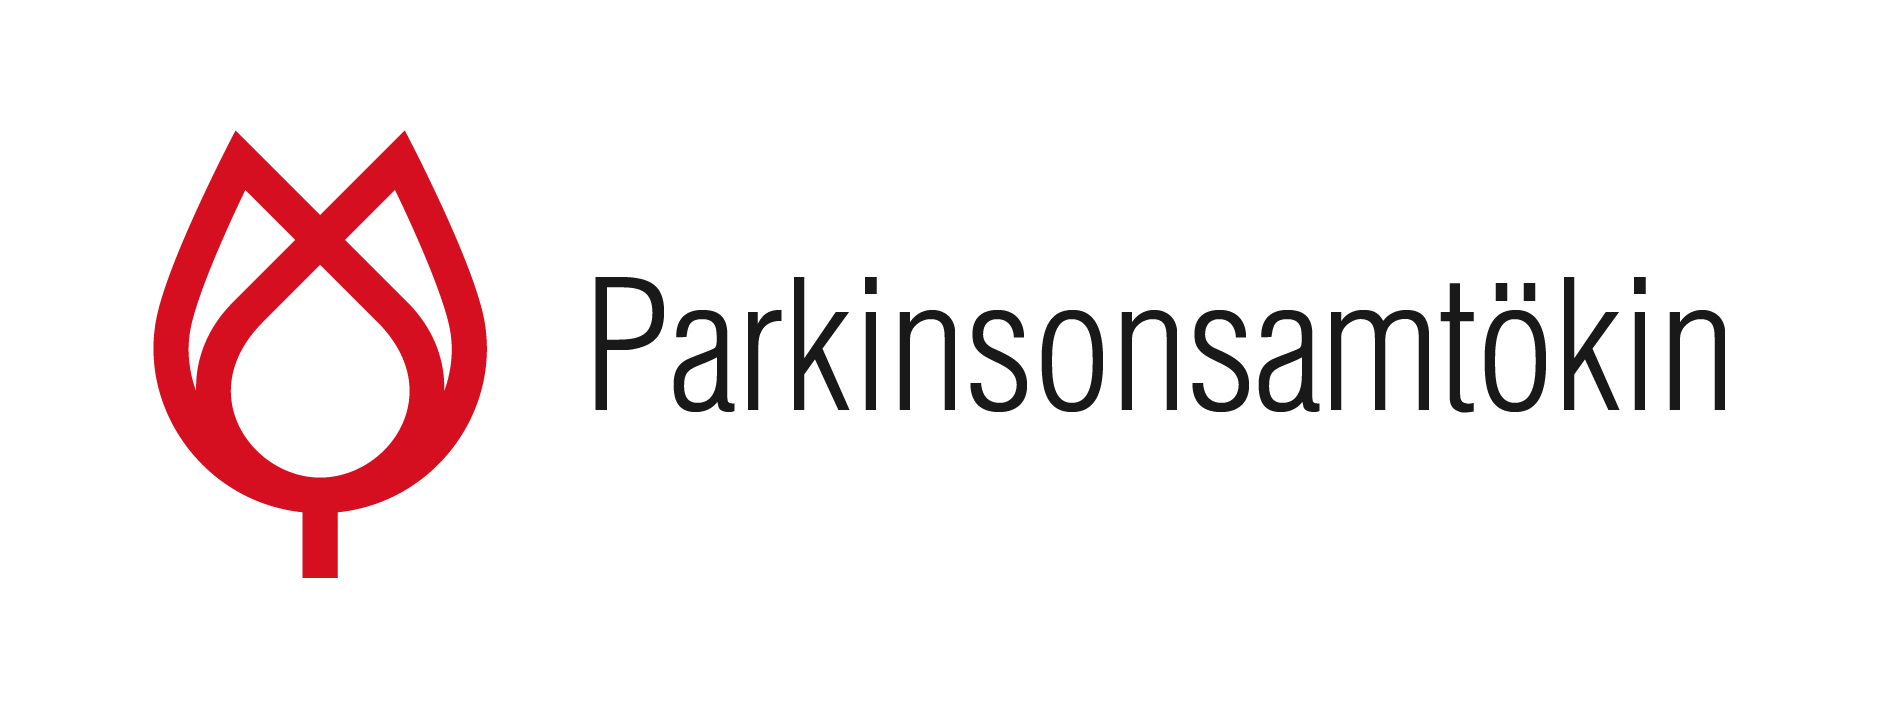 PARKINSONSAMTÖKIN